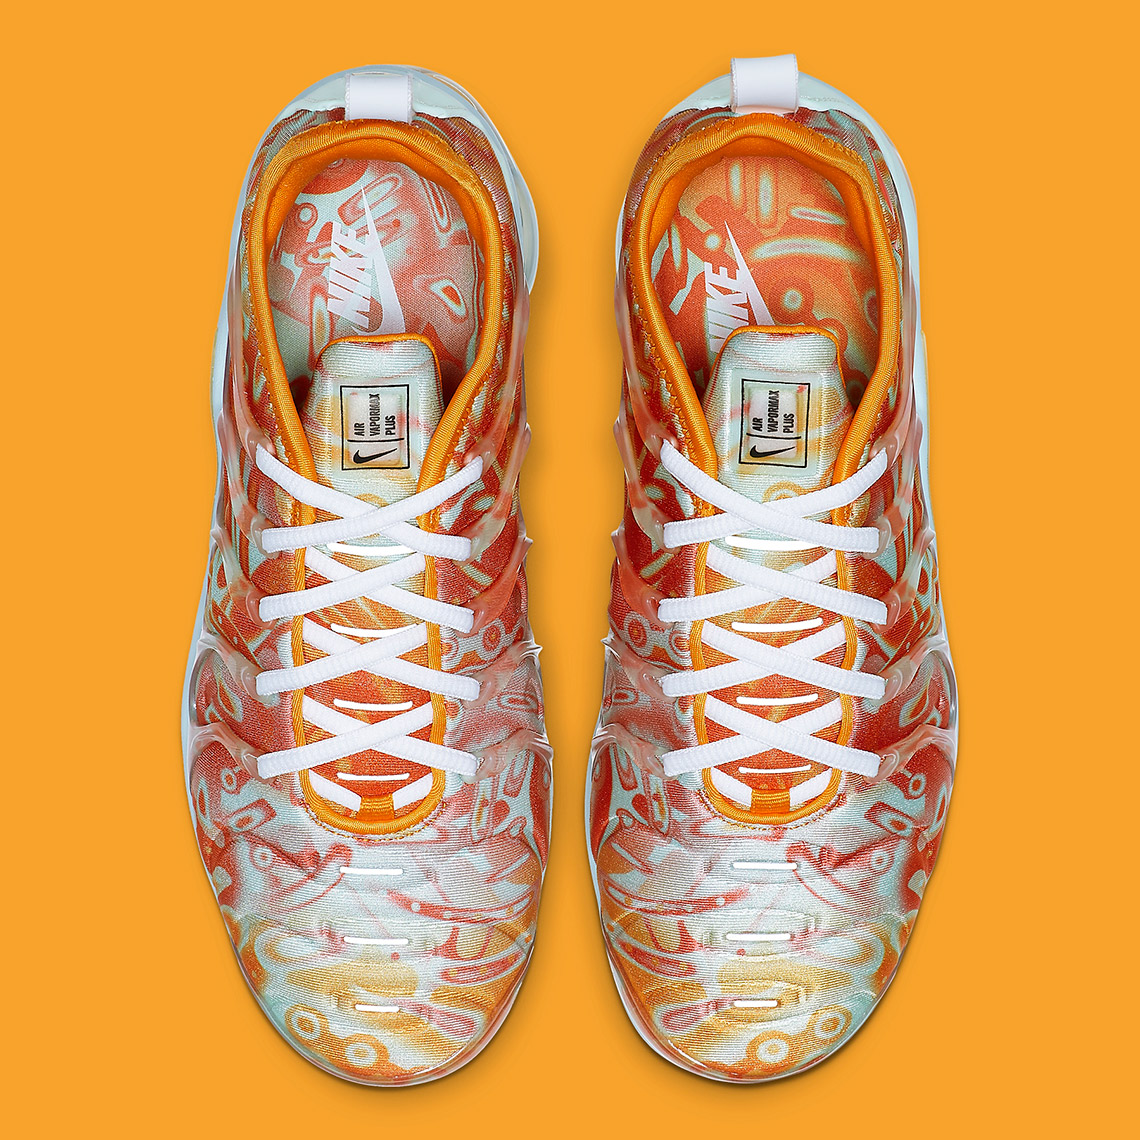 Nike Vapormax Plus CD7009 300 Release